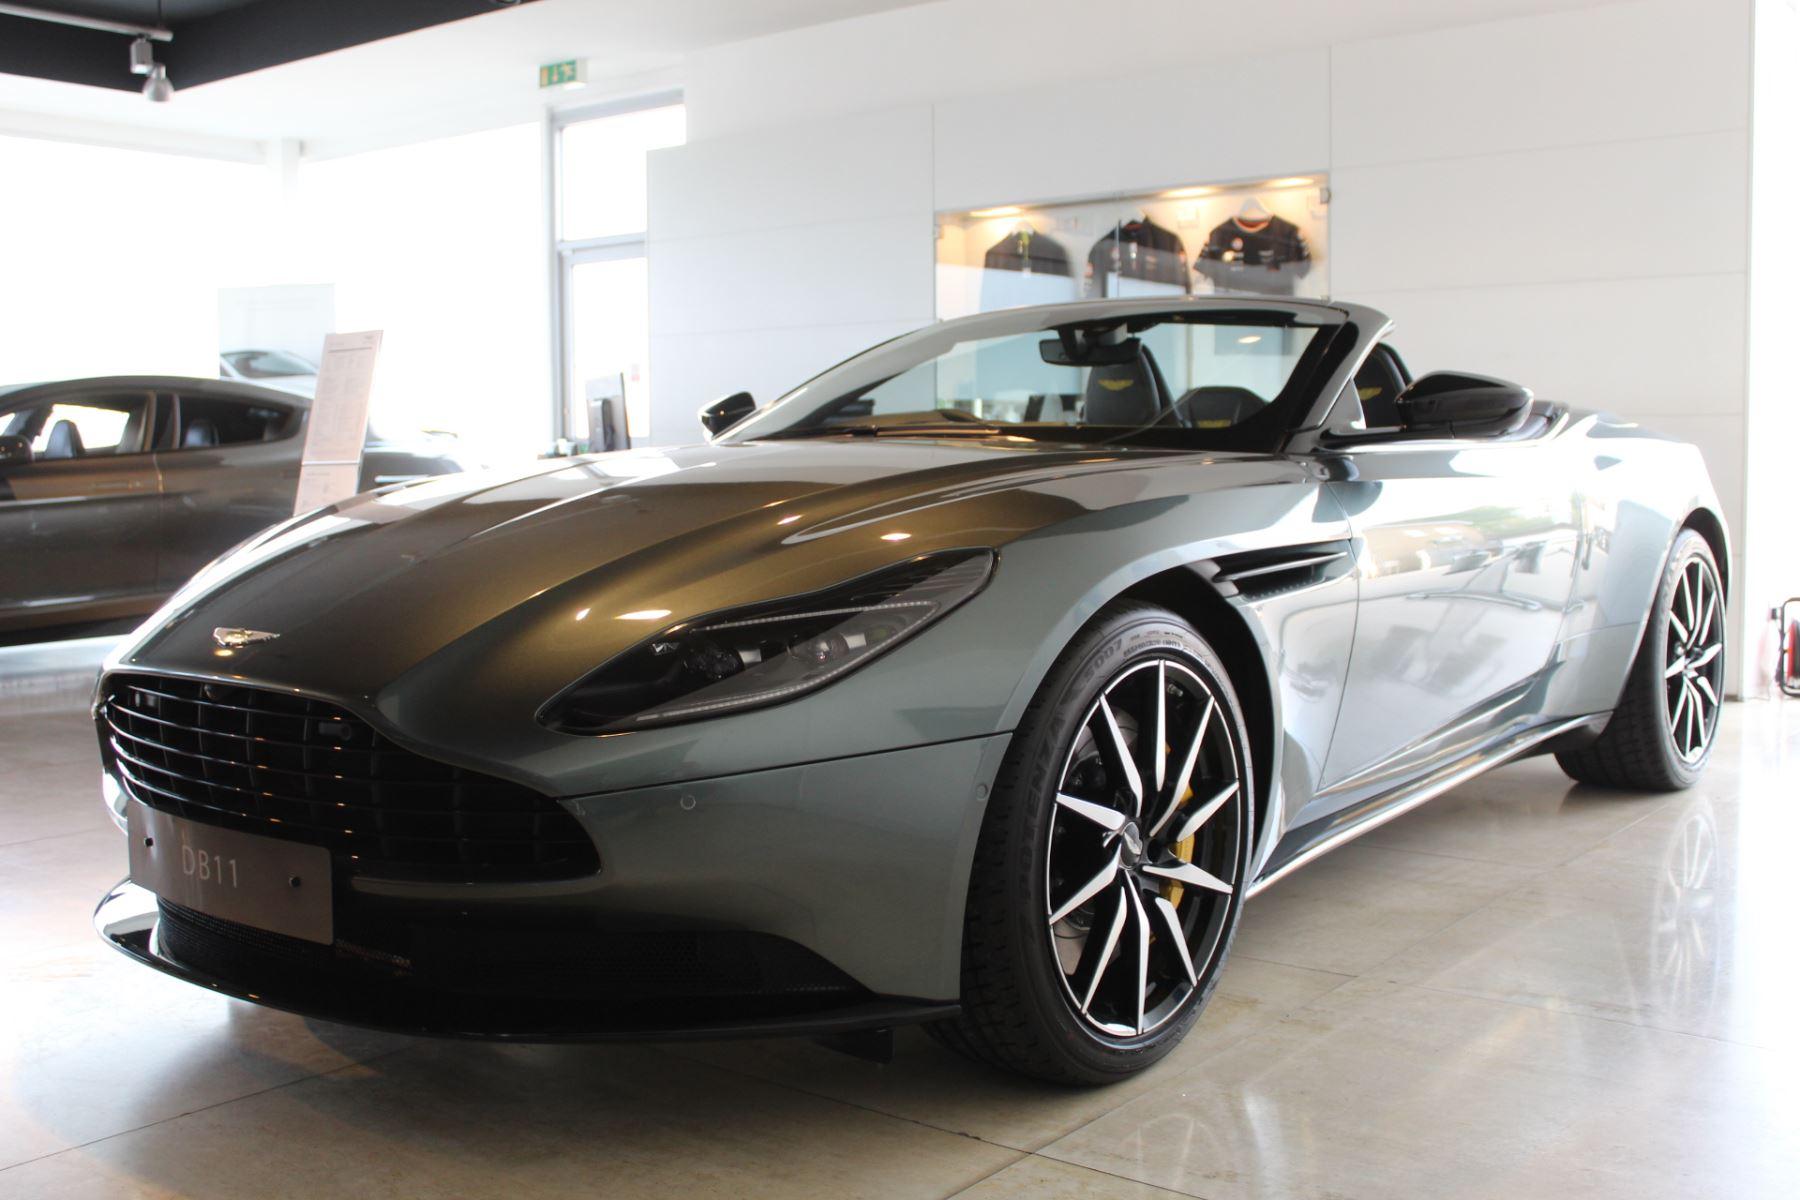 Aston Martin DB11 V8 Volante Touchtronic image 1